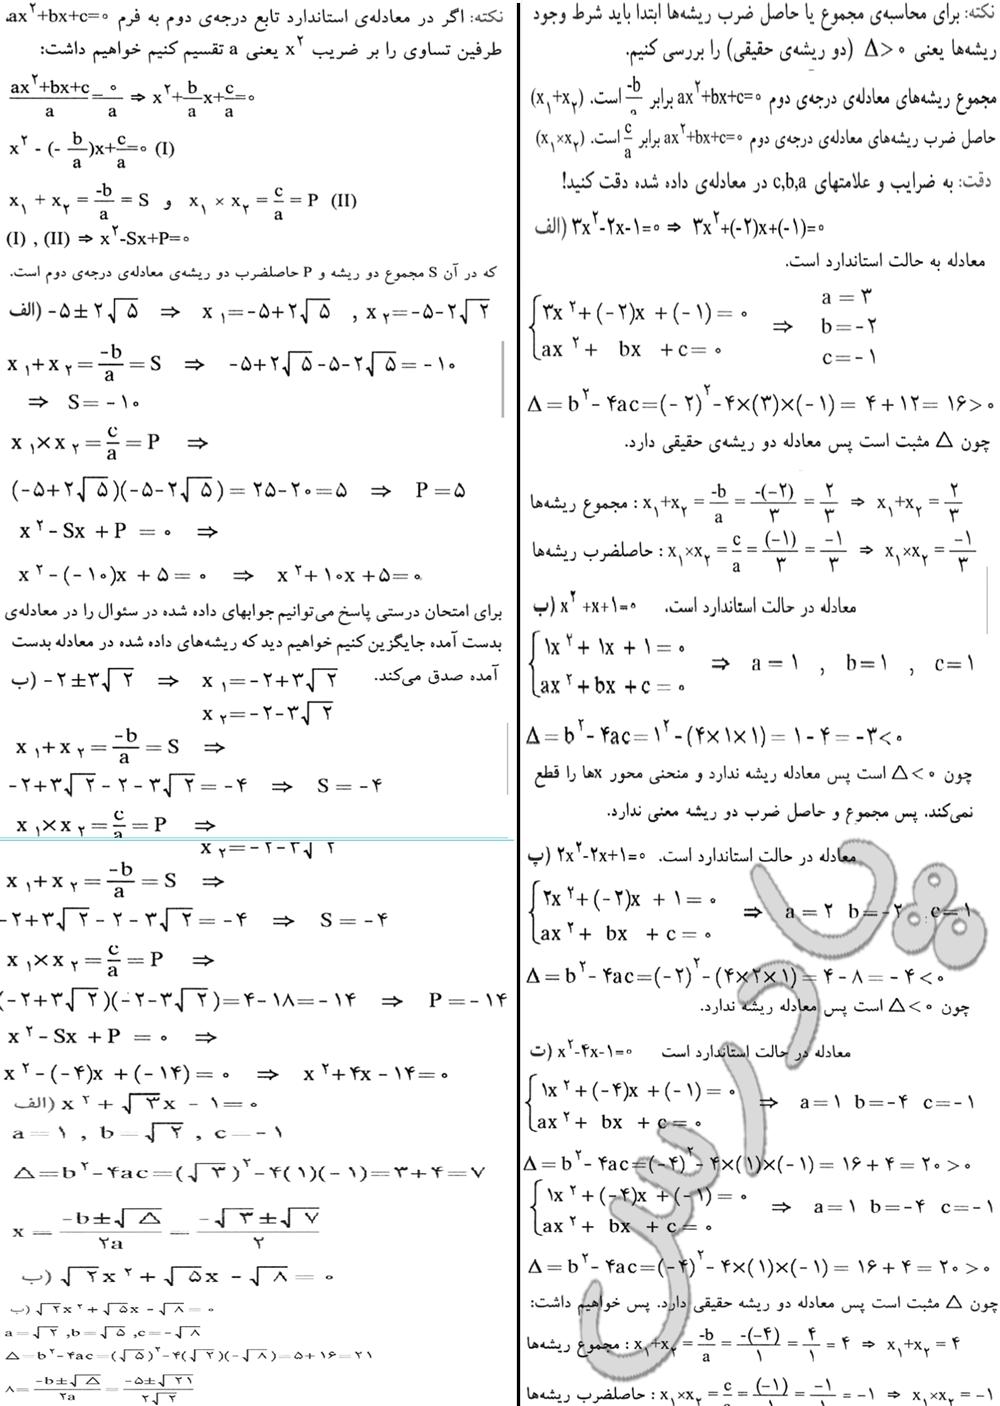 حل مسائل صفحه 69 ریاضی سوم انسانی